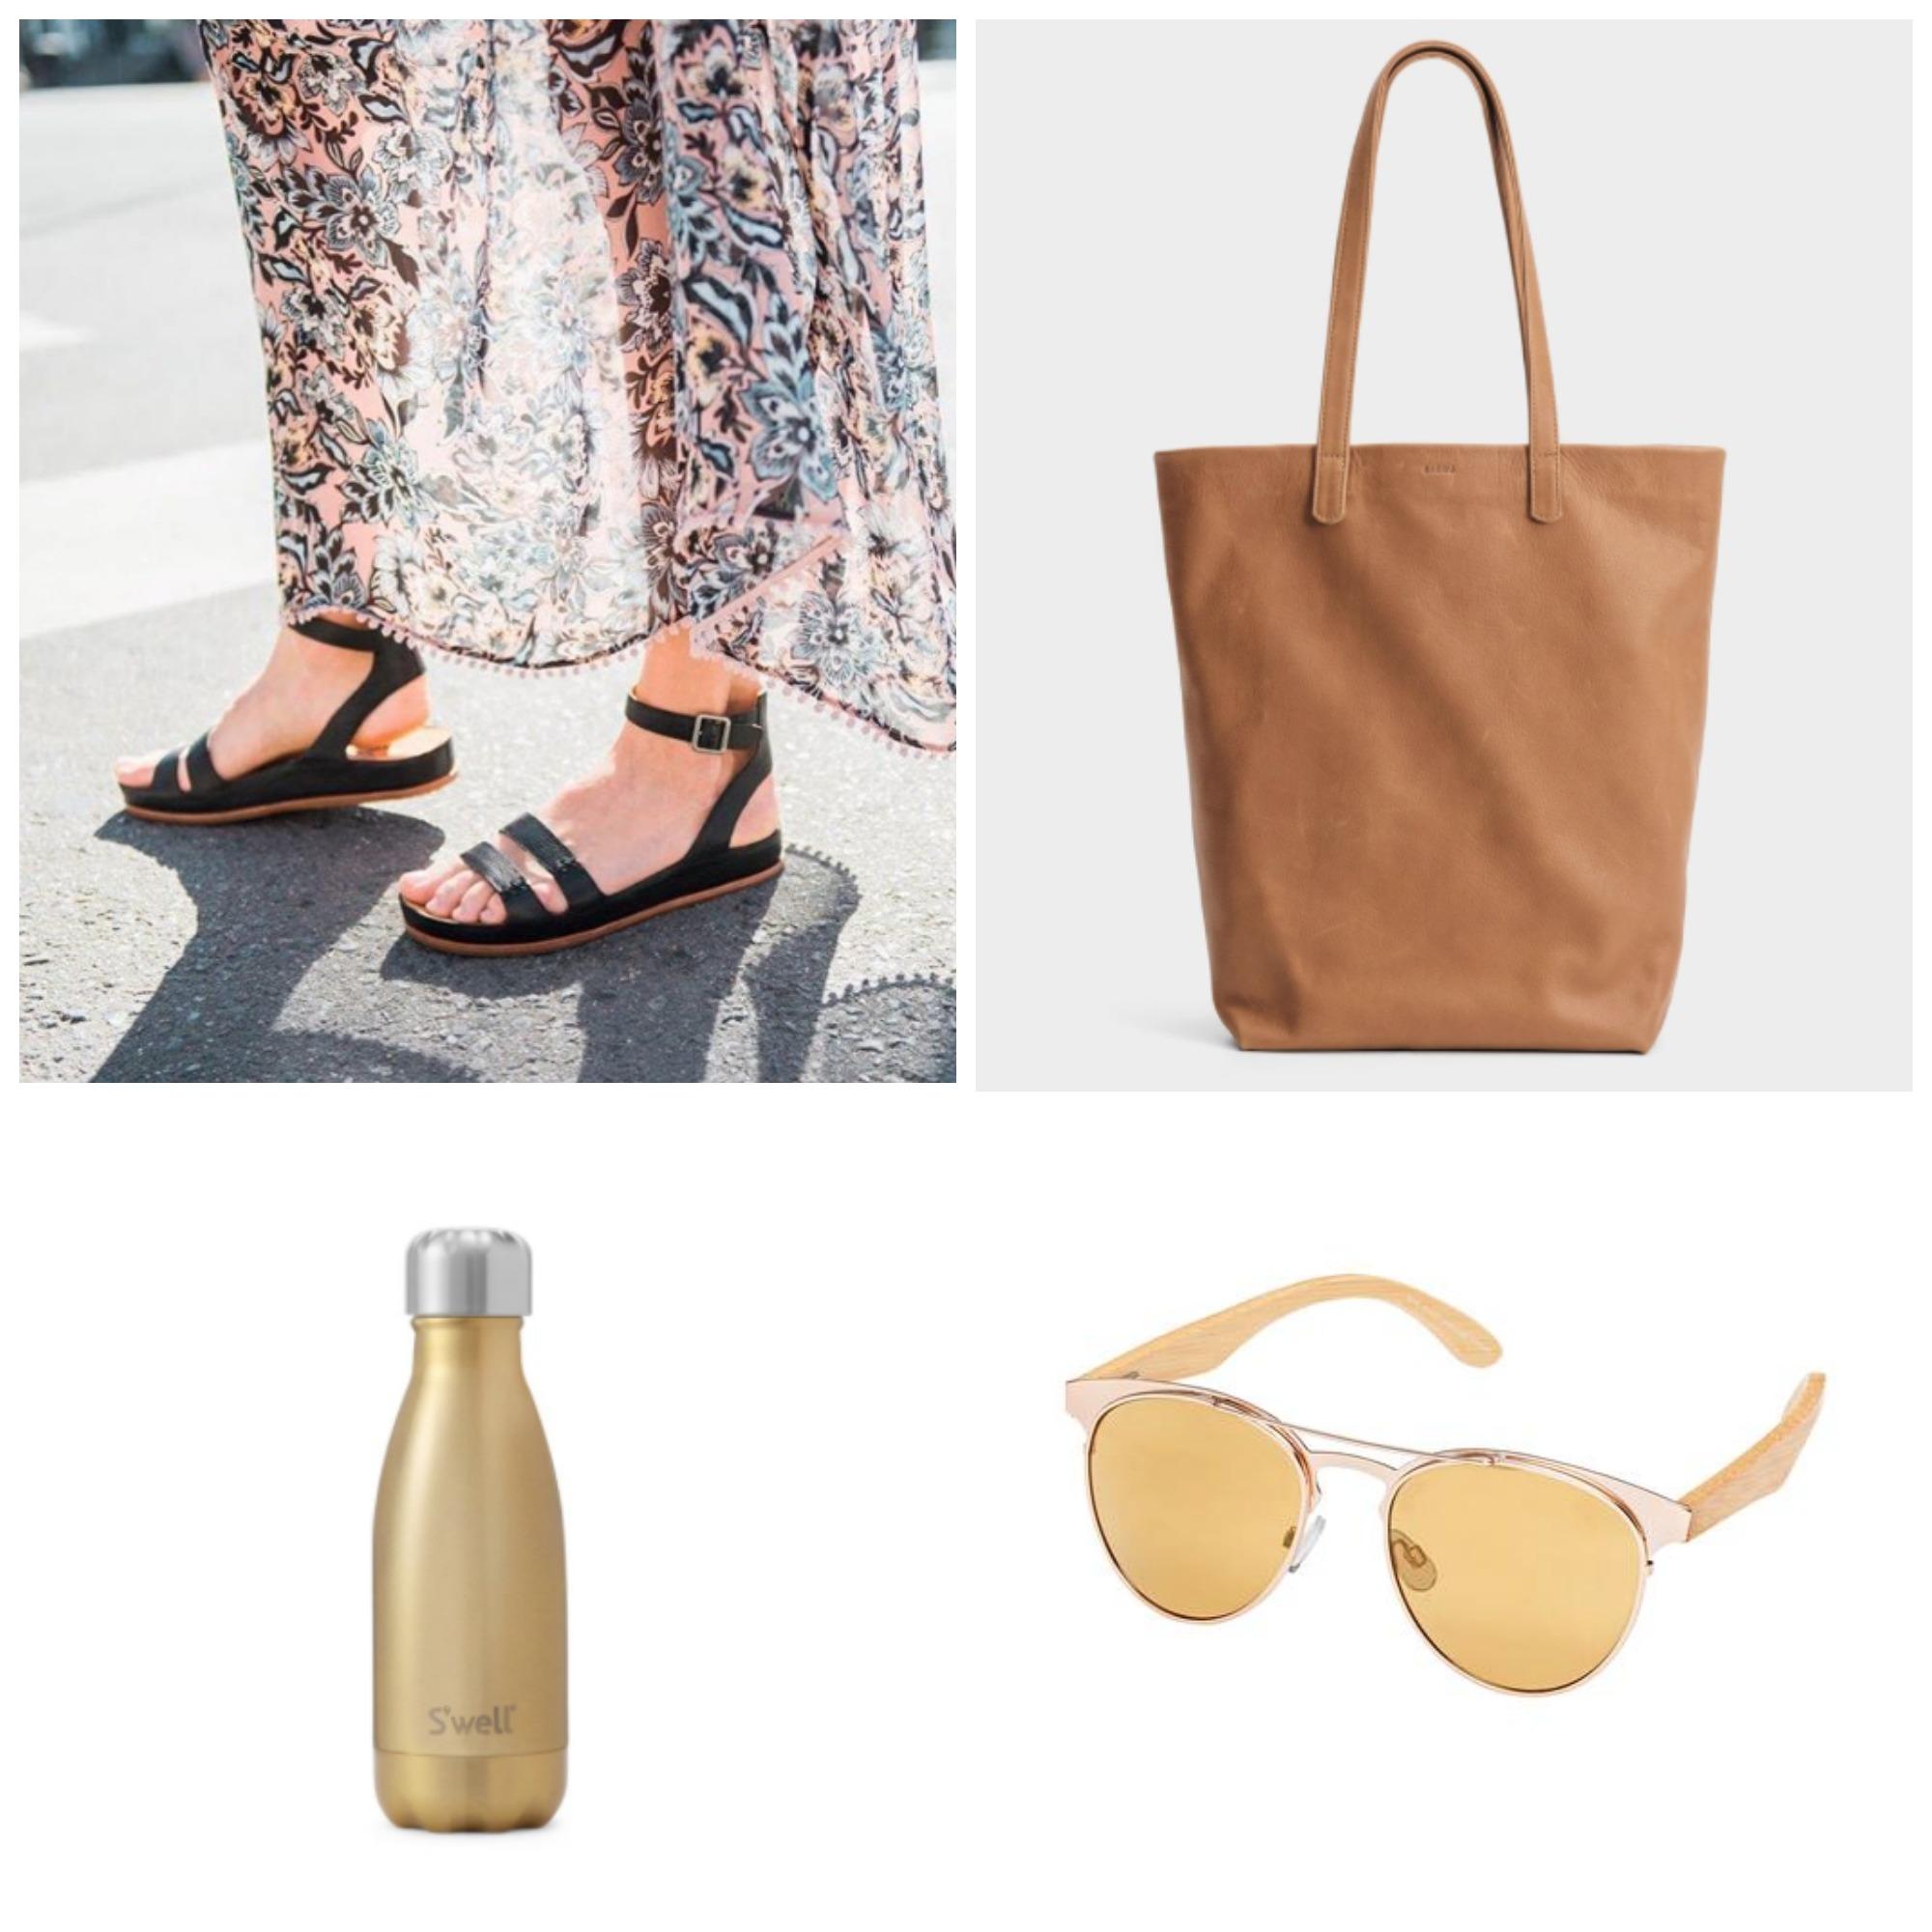 Korkease 'Audrina' sandal, Baggu leather tote, 9oz S'well bottle, Blue Planet sunglasses